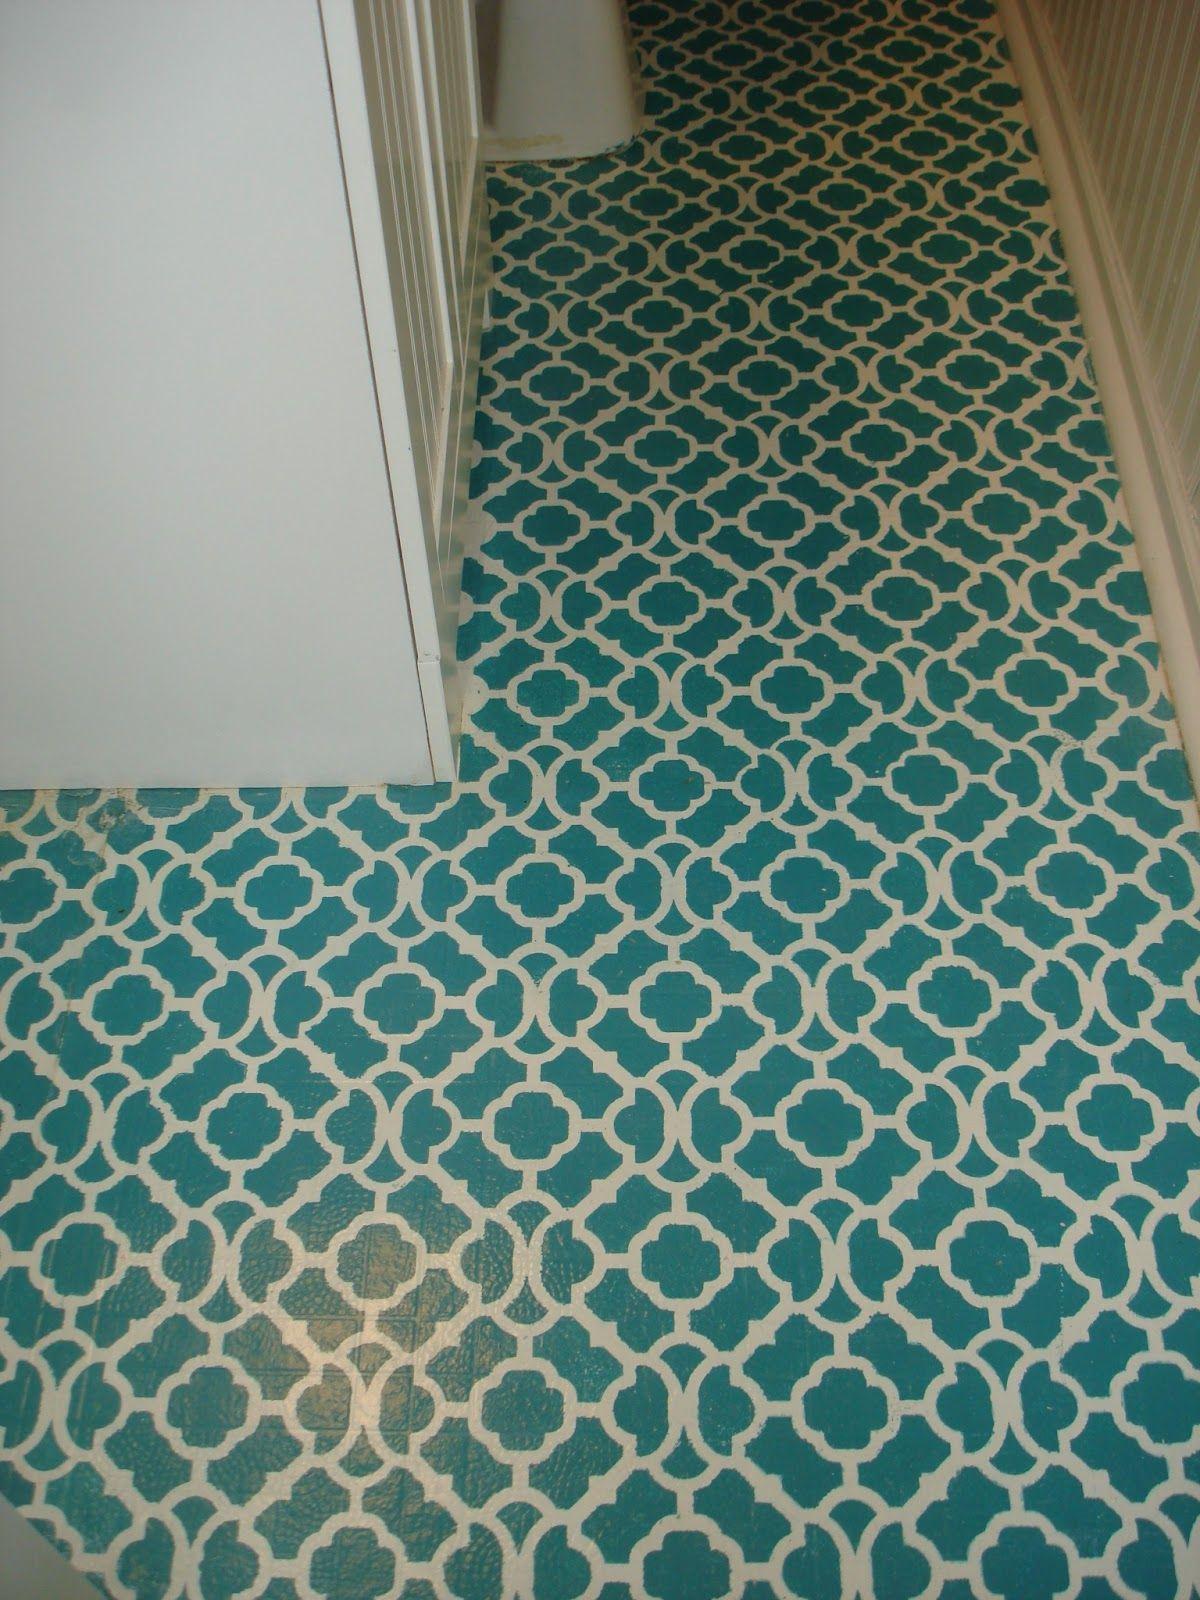 stencil paint over vinyl floors  vinyl flooring painted